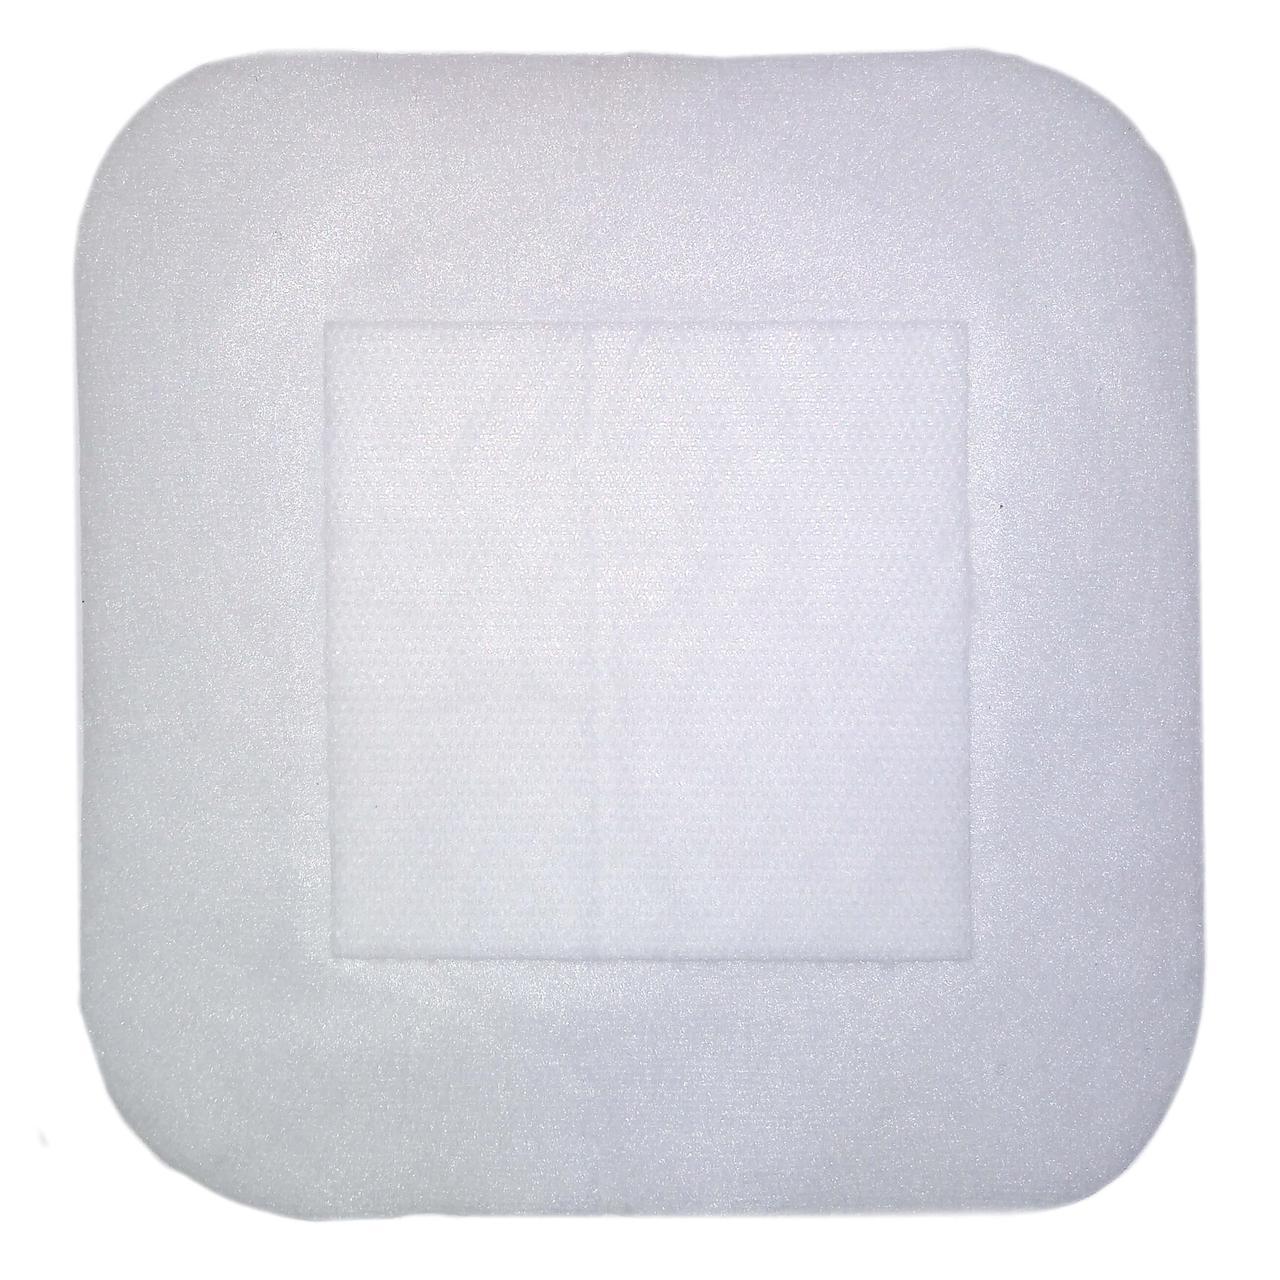 Cosmopor Steril 15x15 см - повязка стерильная на рану